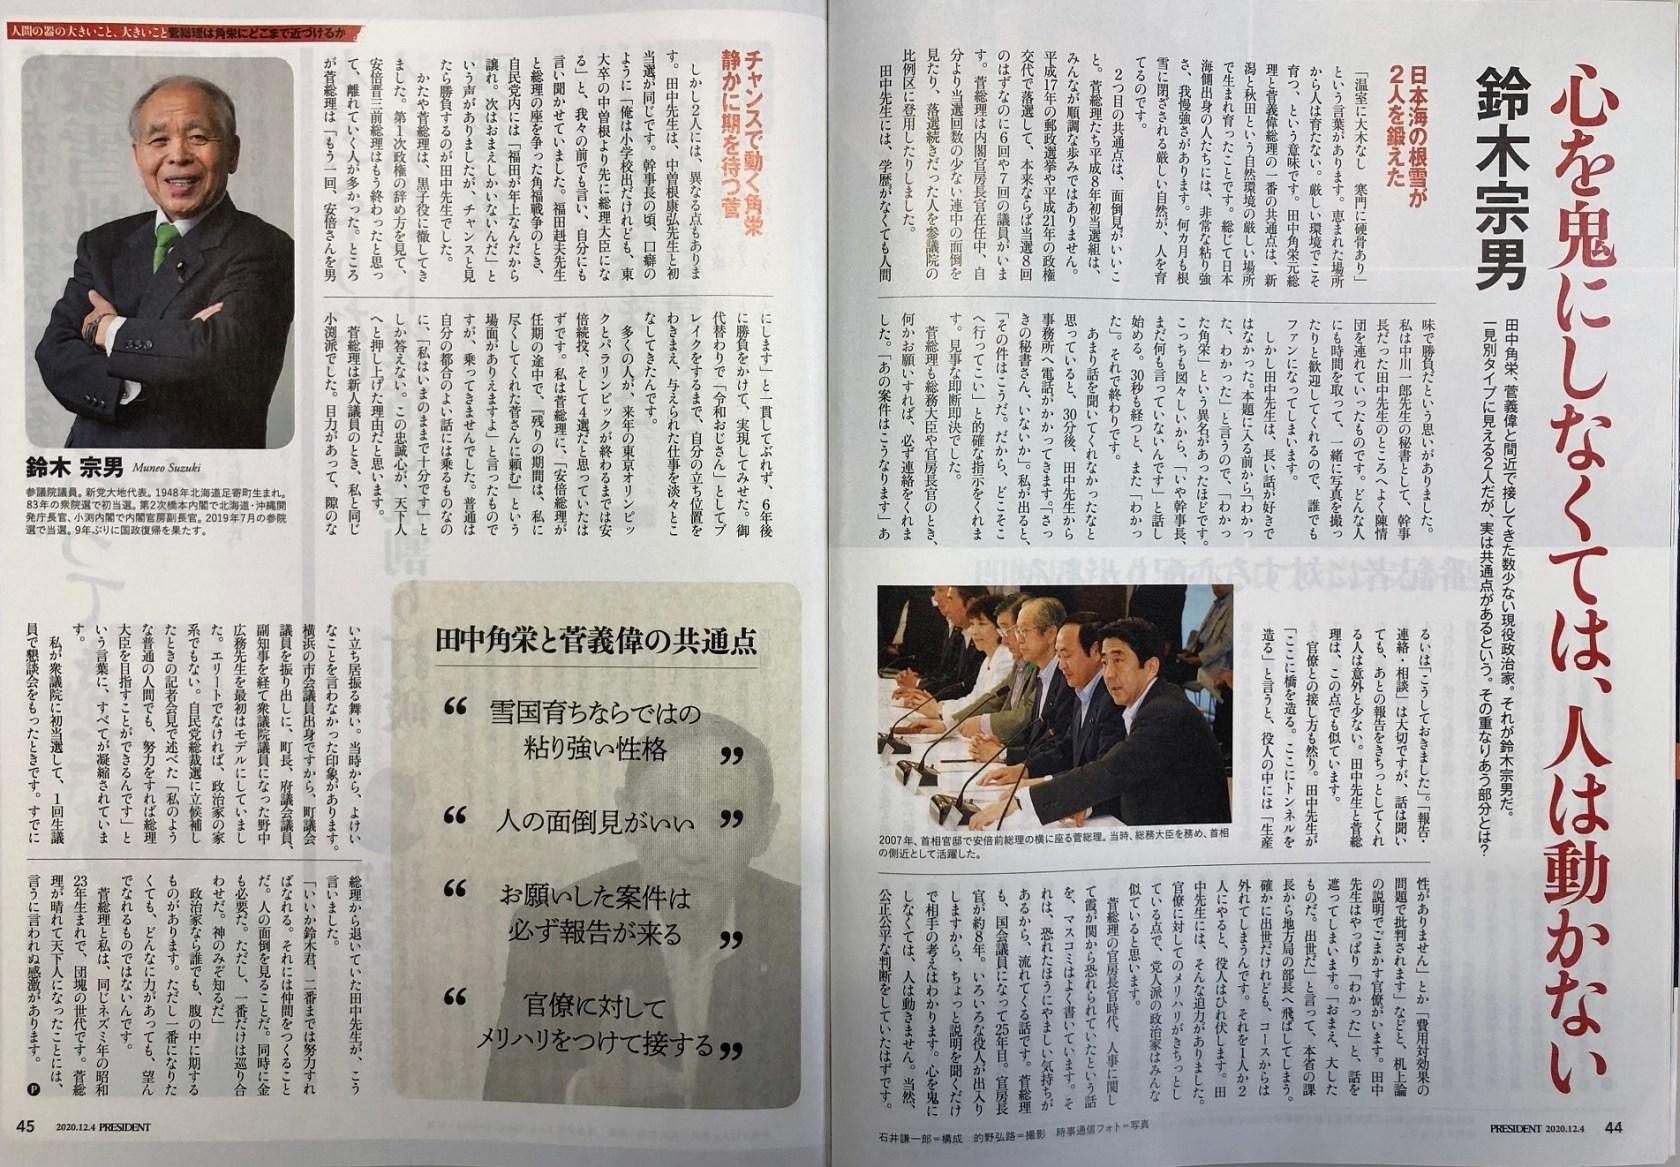 PRESIDENT2020.12.4号 鈴木宗男「心を鬼にしなくては、人は動かない」